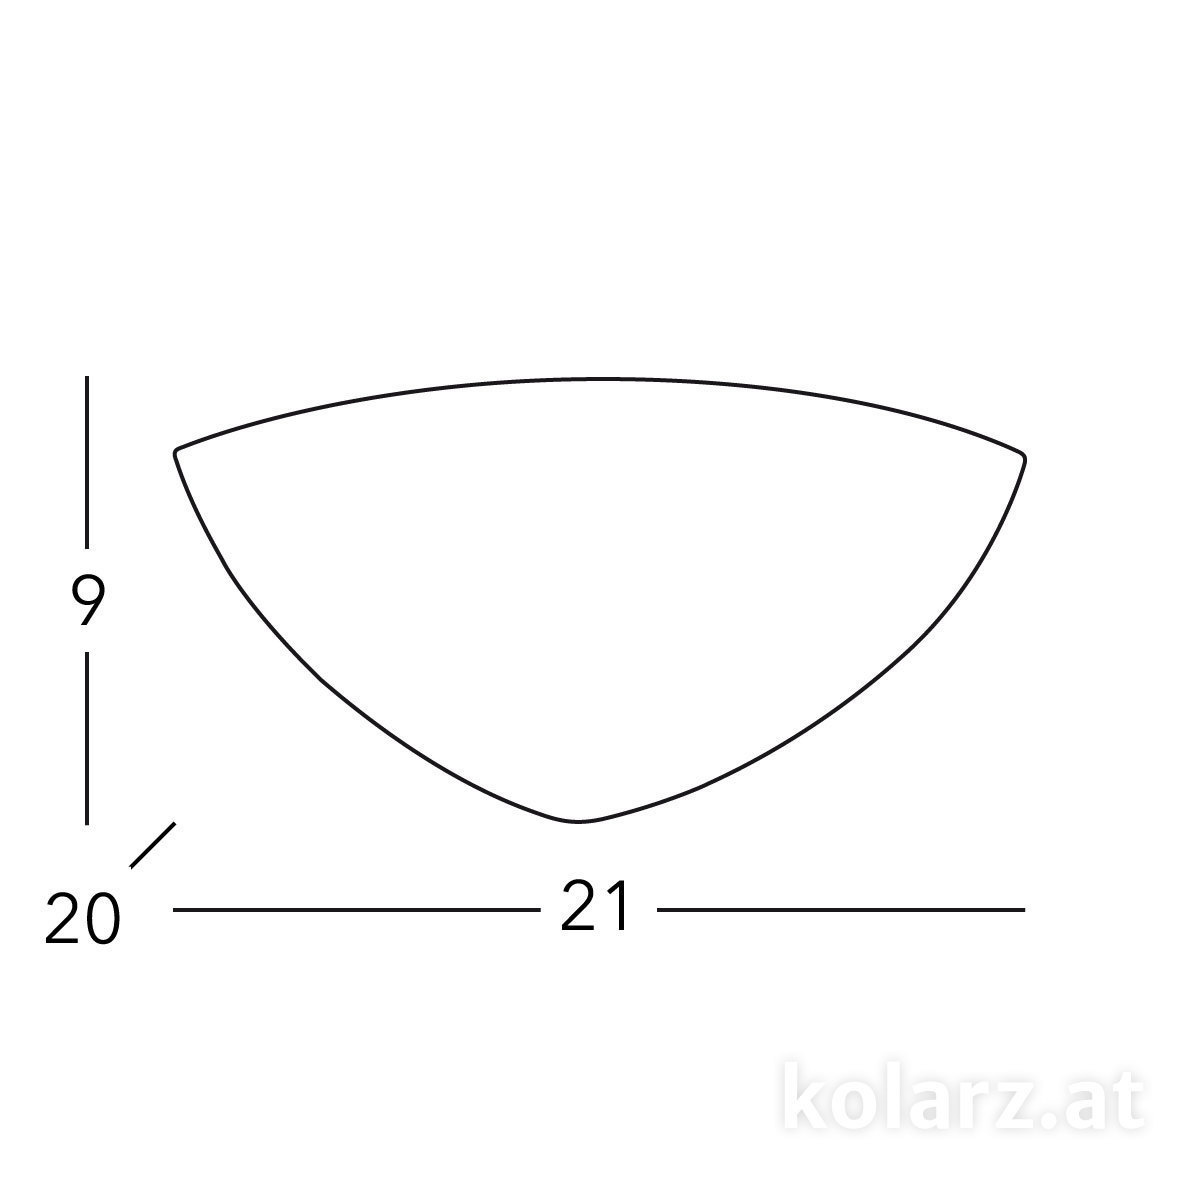 588-64-s1.jpg